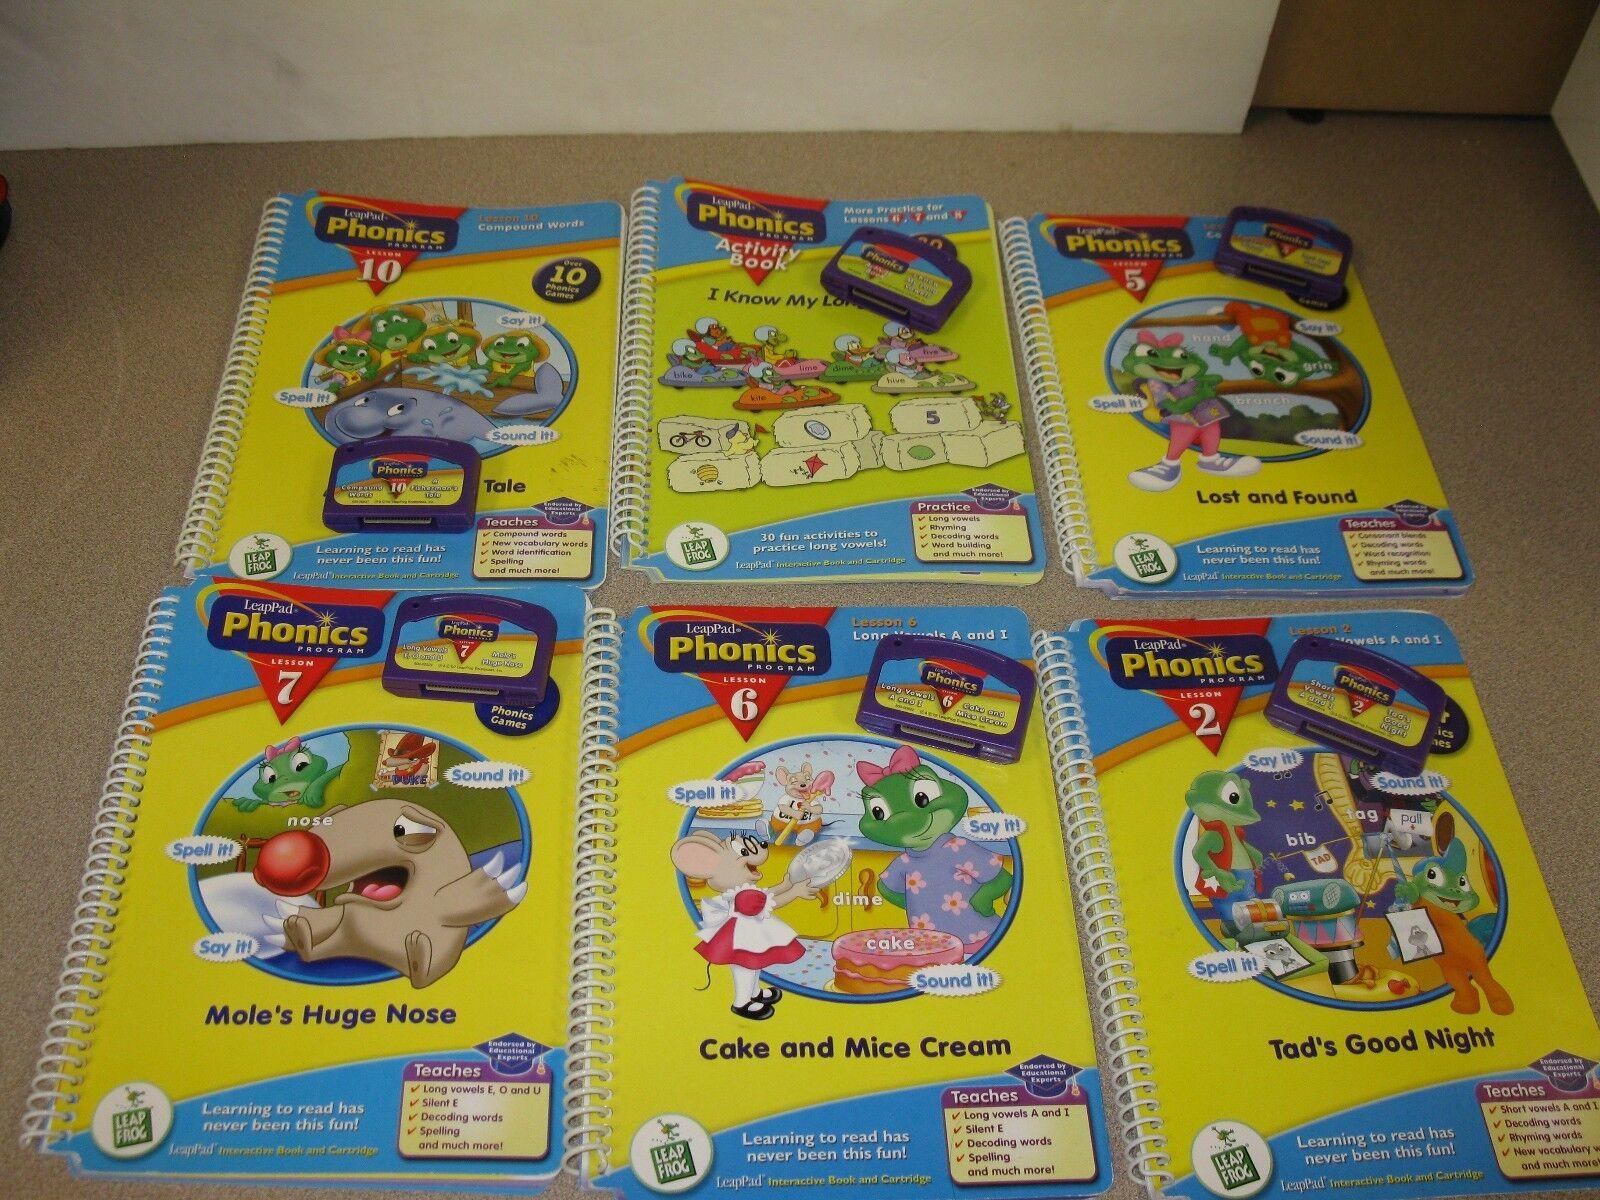 6 LEAPPAD PHONIC PROGRAM ACTIVITY BOOK LESSON   CARTRIDGES